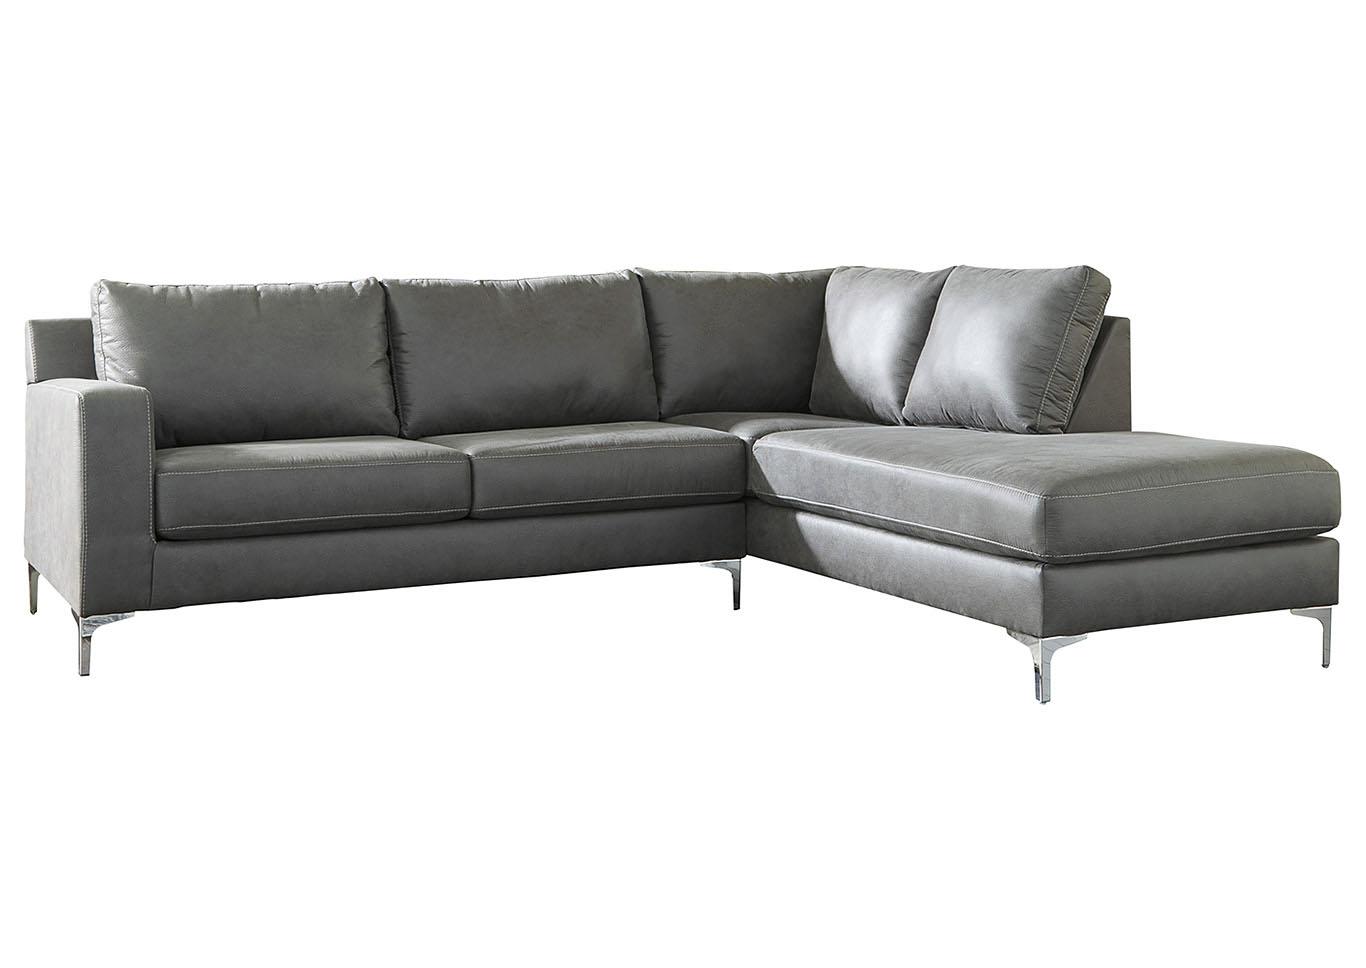 Magnificent Austins Couch Potatoes Furniture Stores Austin Texas Machost Co Dining Chair Design Ideas Machostcouk